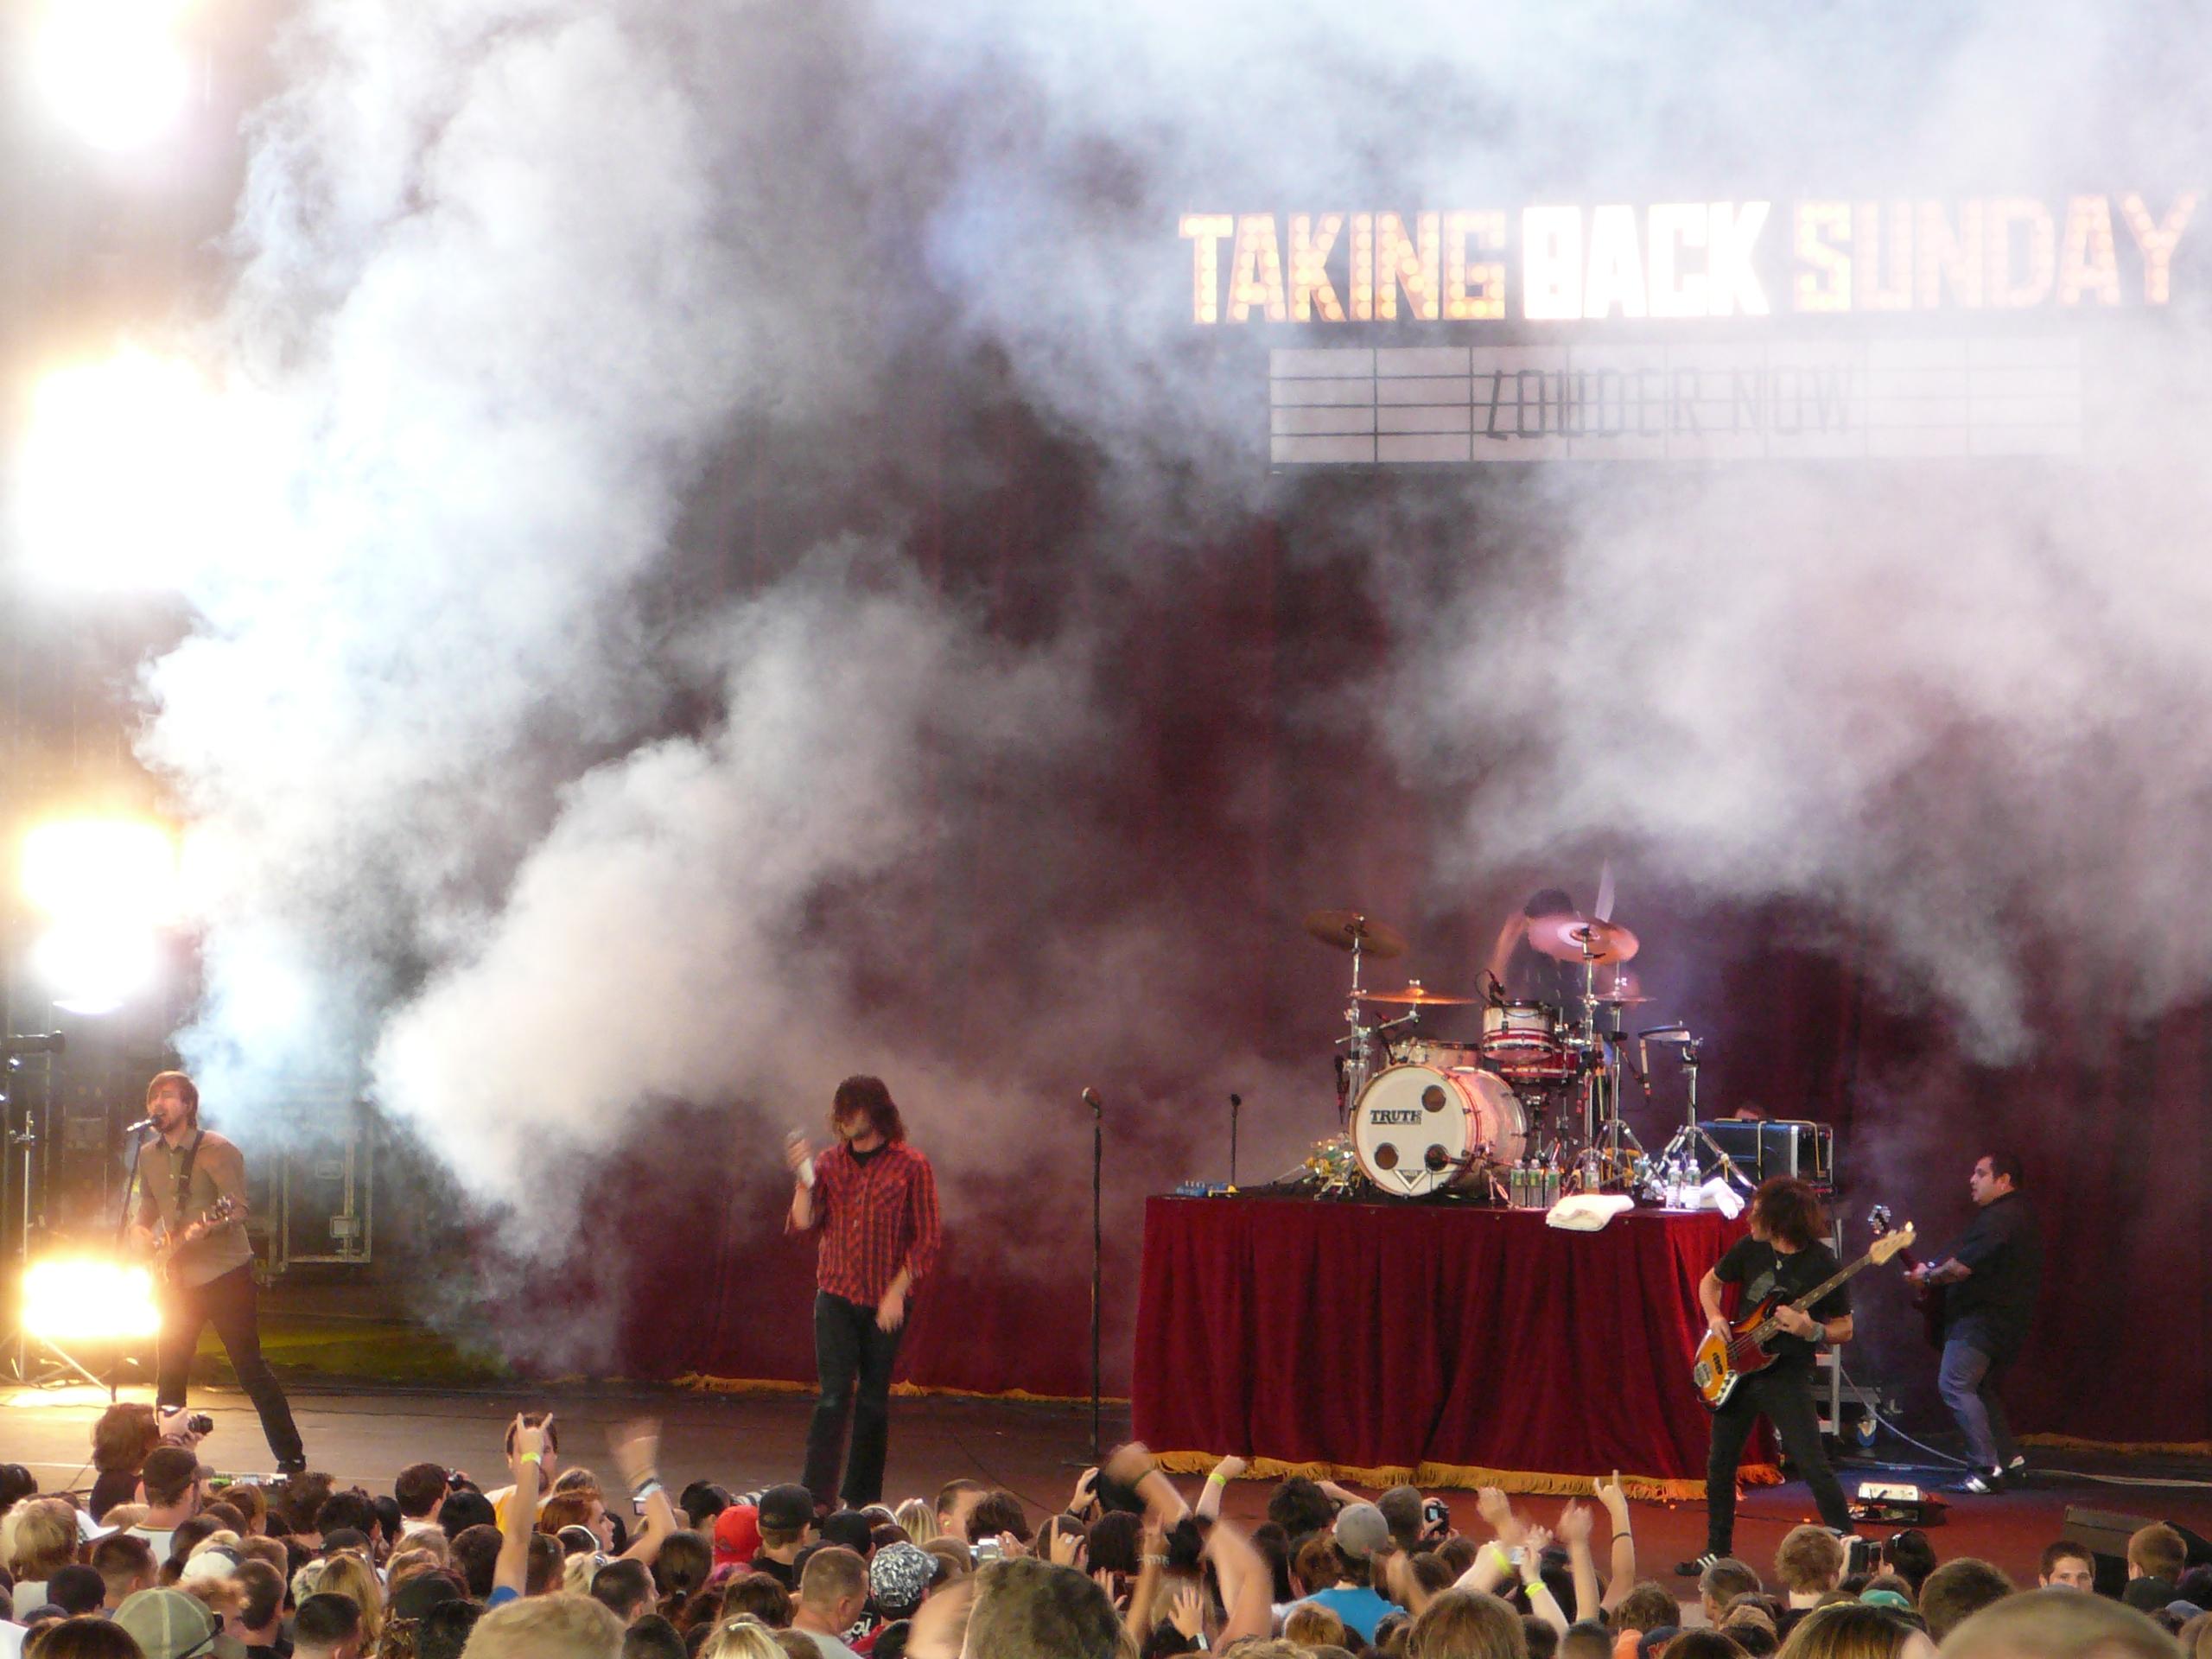 Taking Back Sunday performing on the Projekt Revolution tour in Mansfield, Massachusetts on August 24, 2007